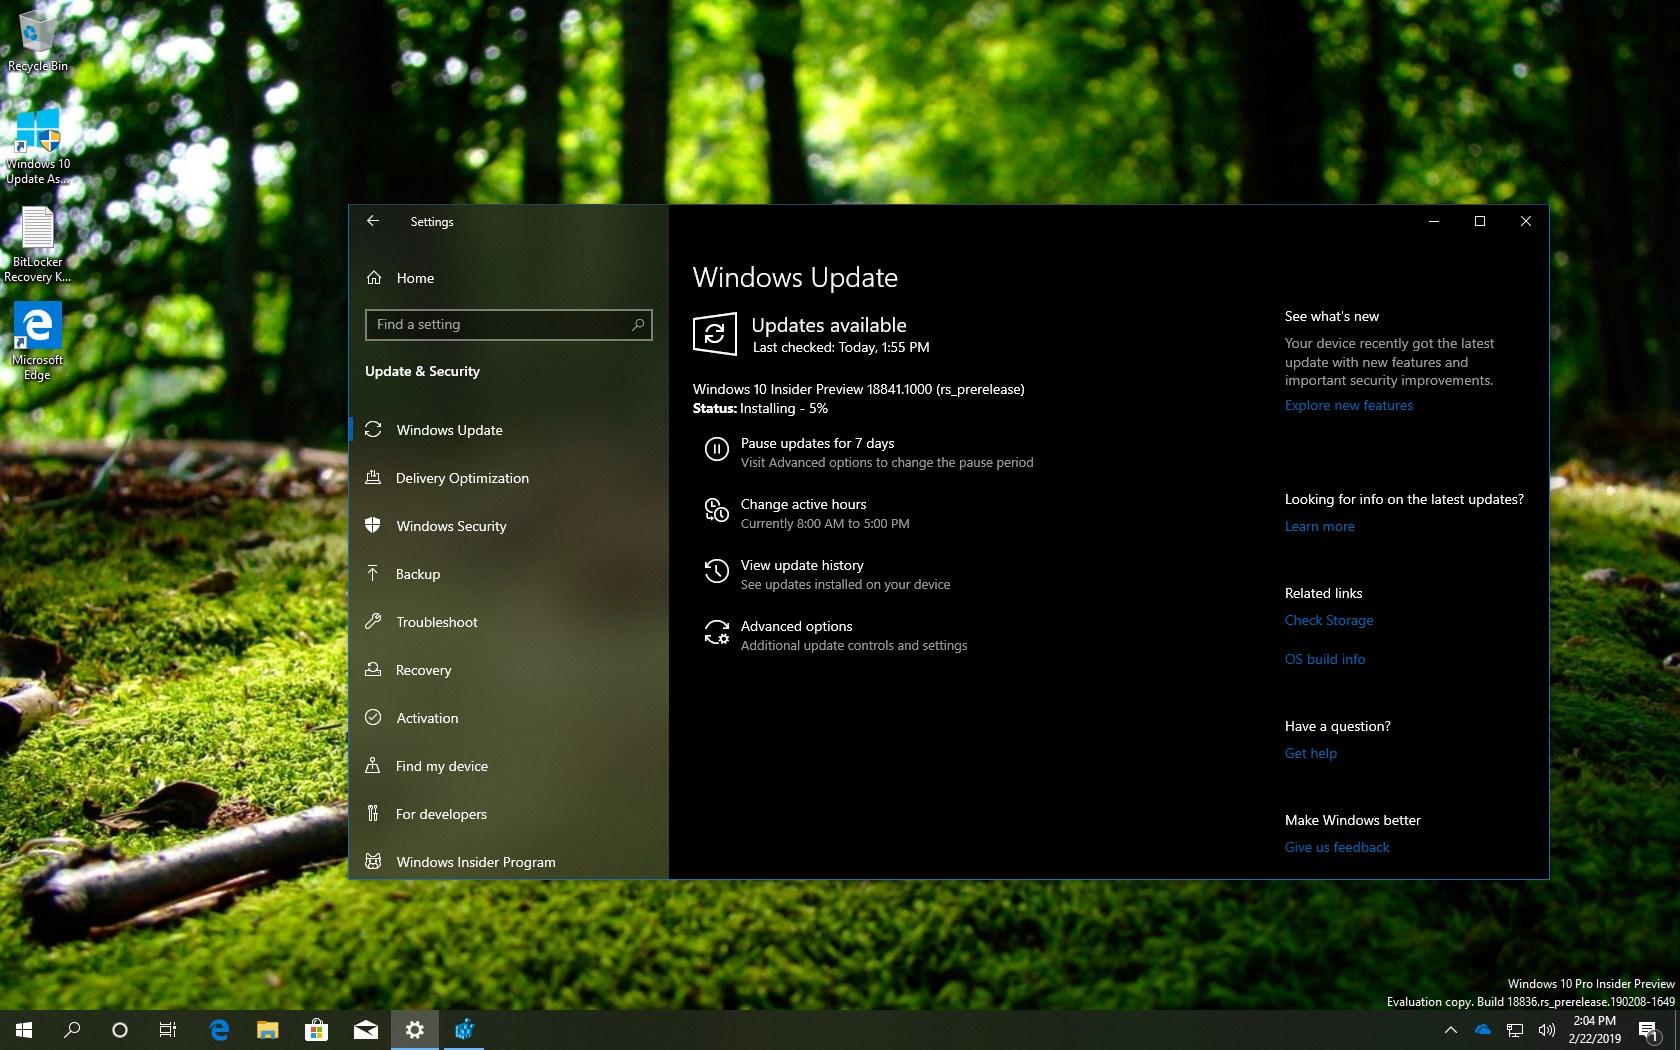 Windows 10 build 18841